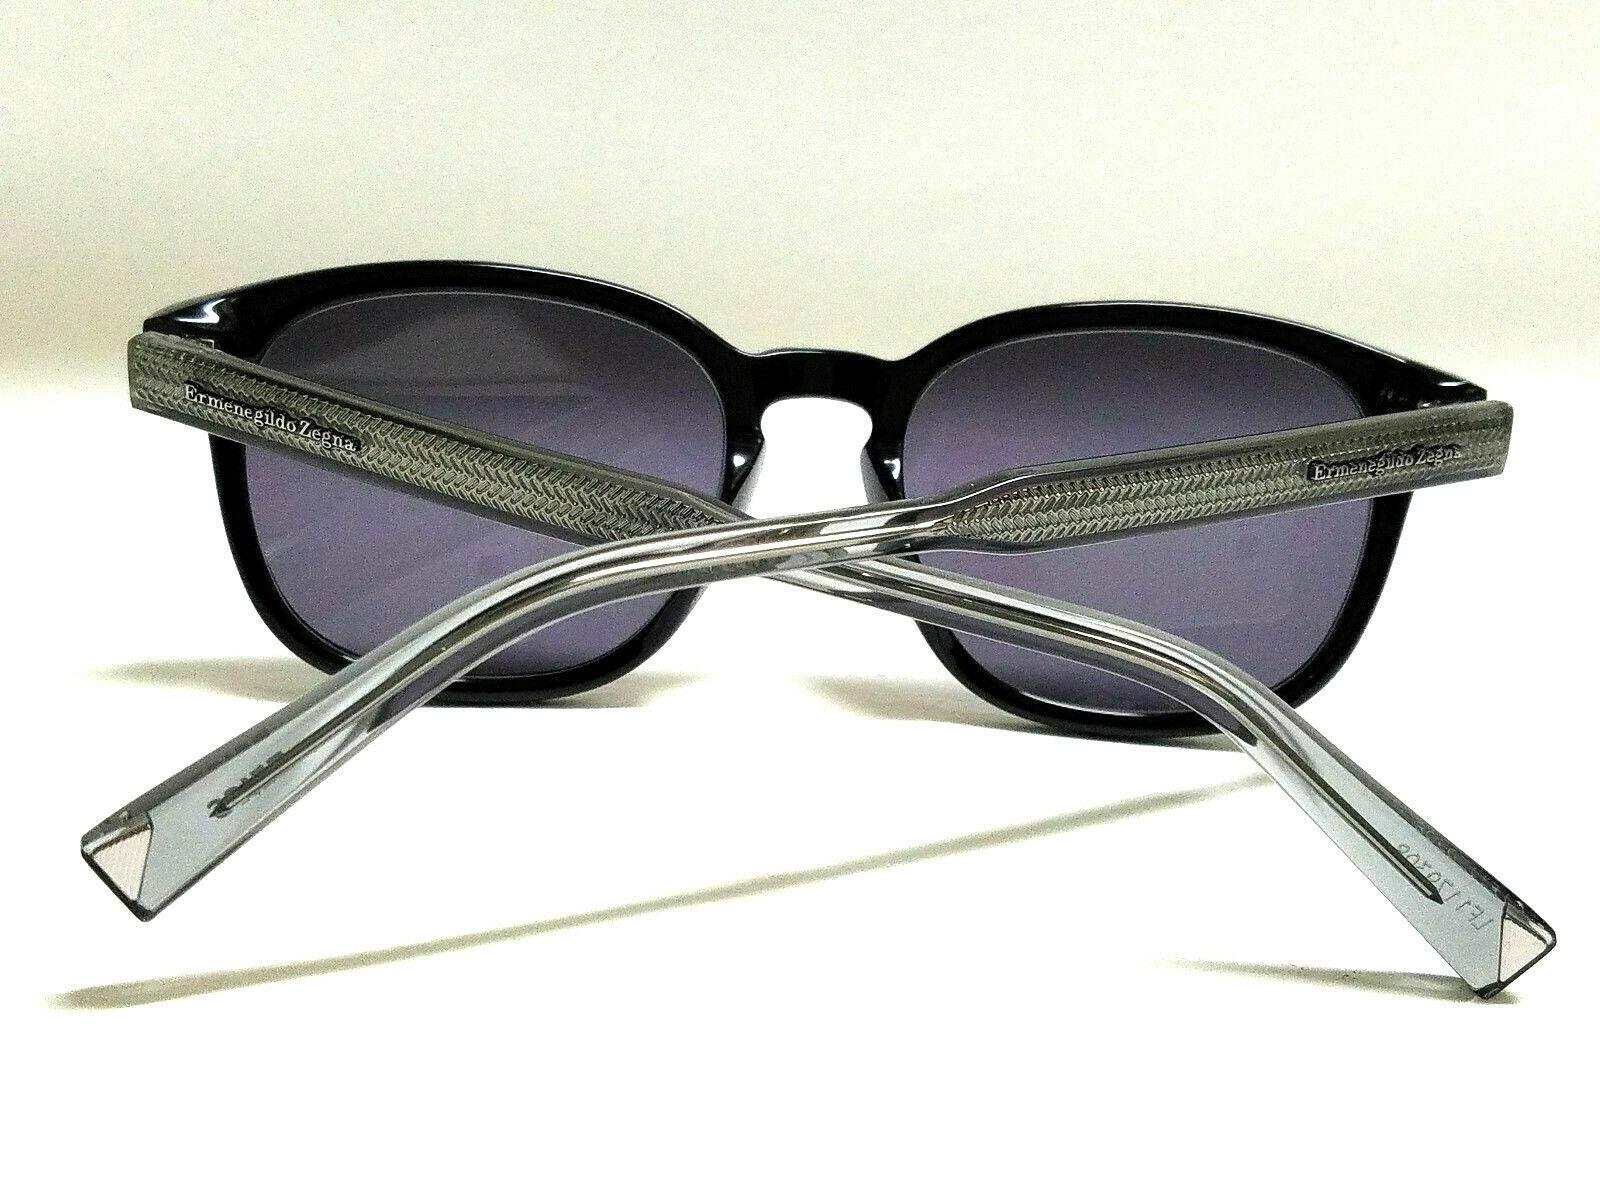 New Authentic ERMENEGILDO ZEGNA EZ0005S 05A Black/Smoke Lens 52mm Sunglasses